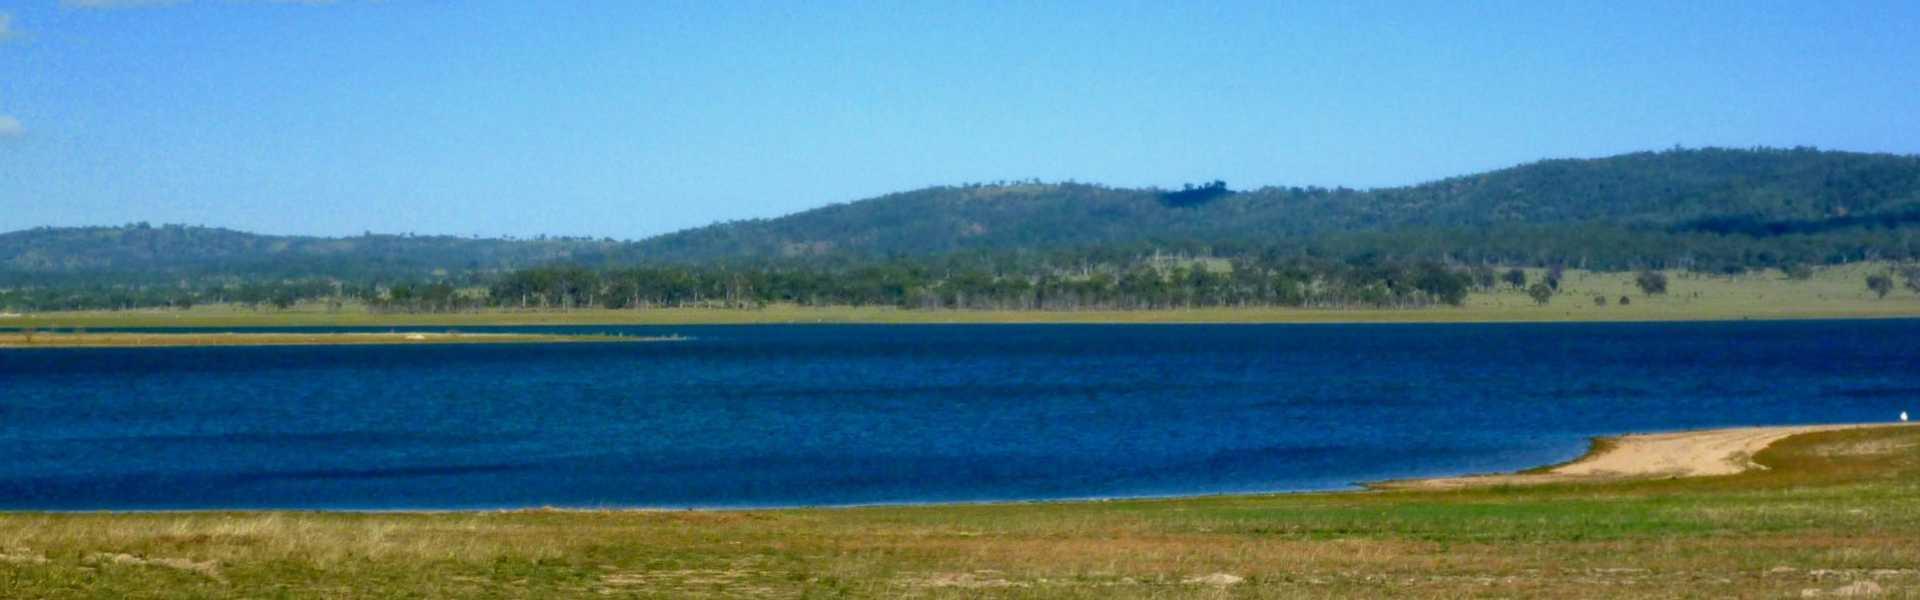 Kui Parks, Lake Leslie Tourist Park, Leslie Dam